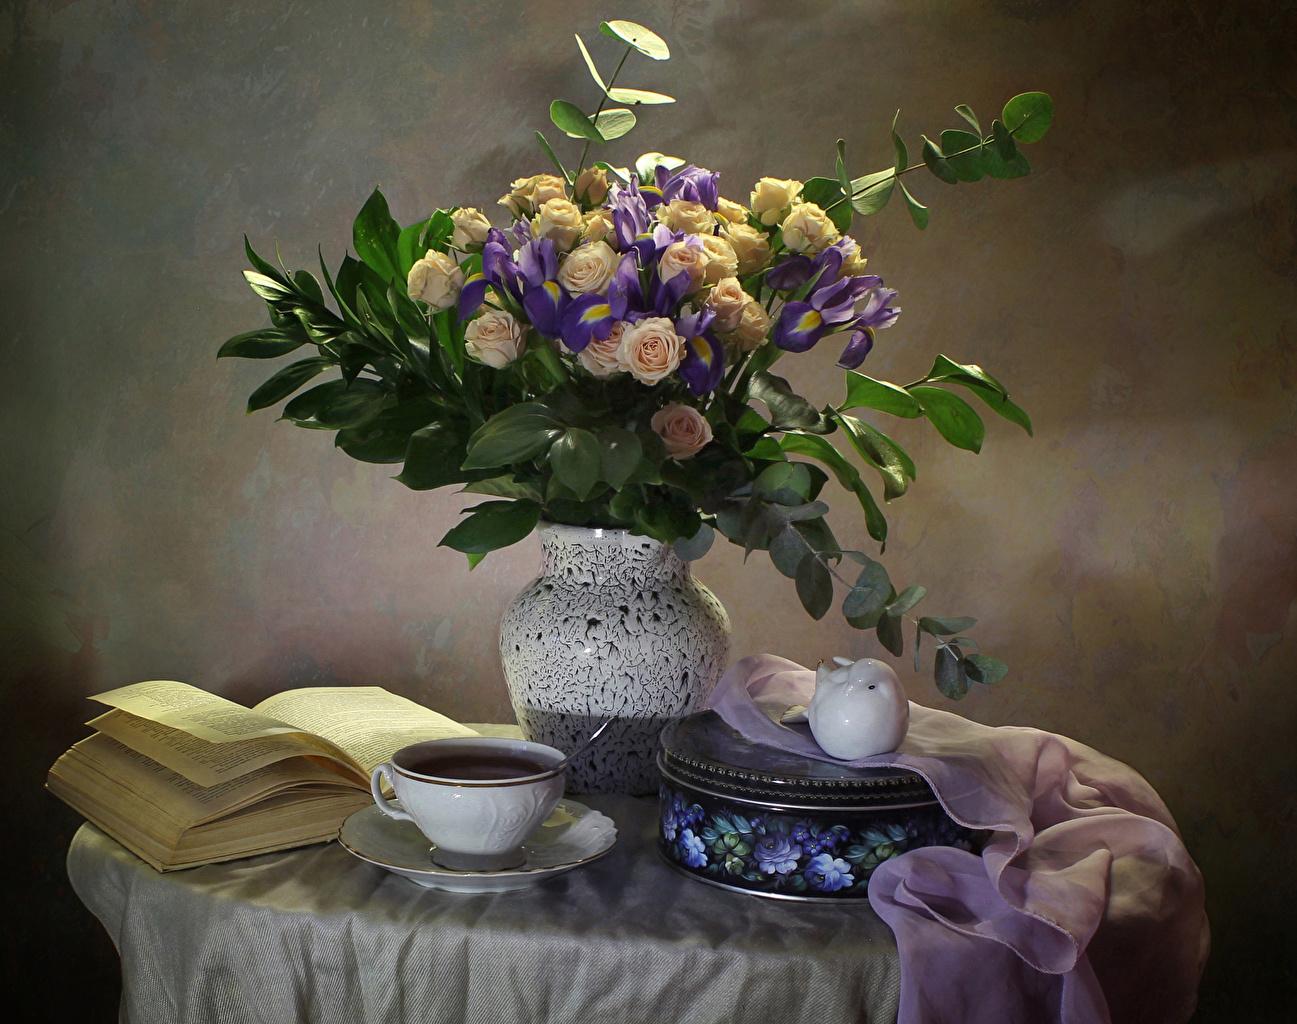 Фотография букет Чай роза ирис цветок вазы чашке Книга Натюрморт Букеты Розы Цветы Ирисы вазе Ваза Чашка книги